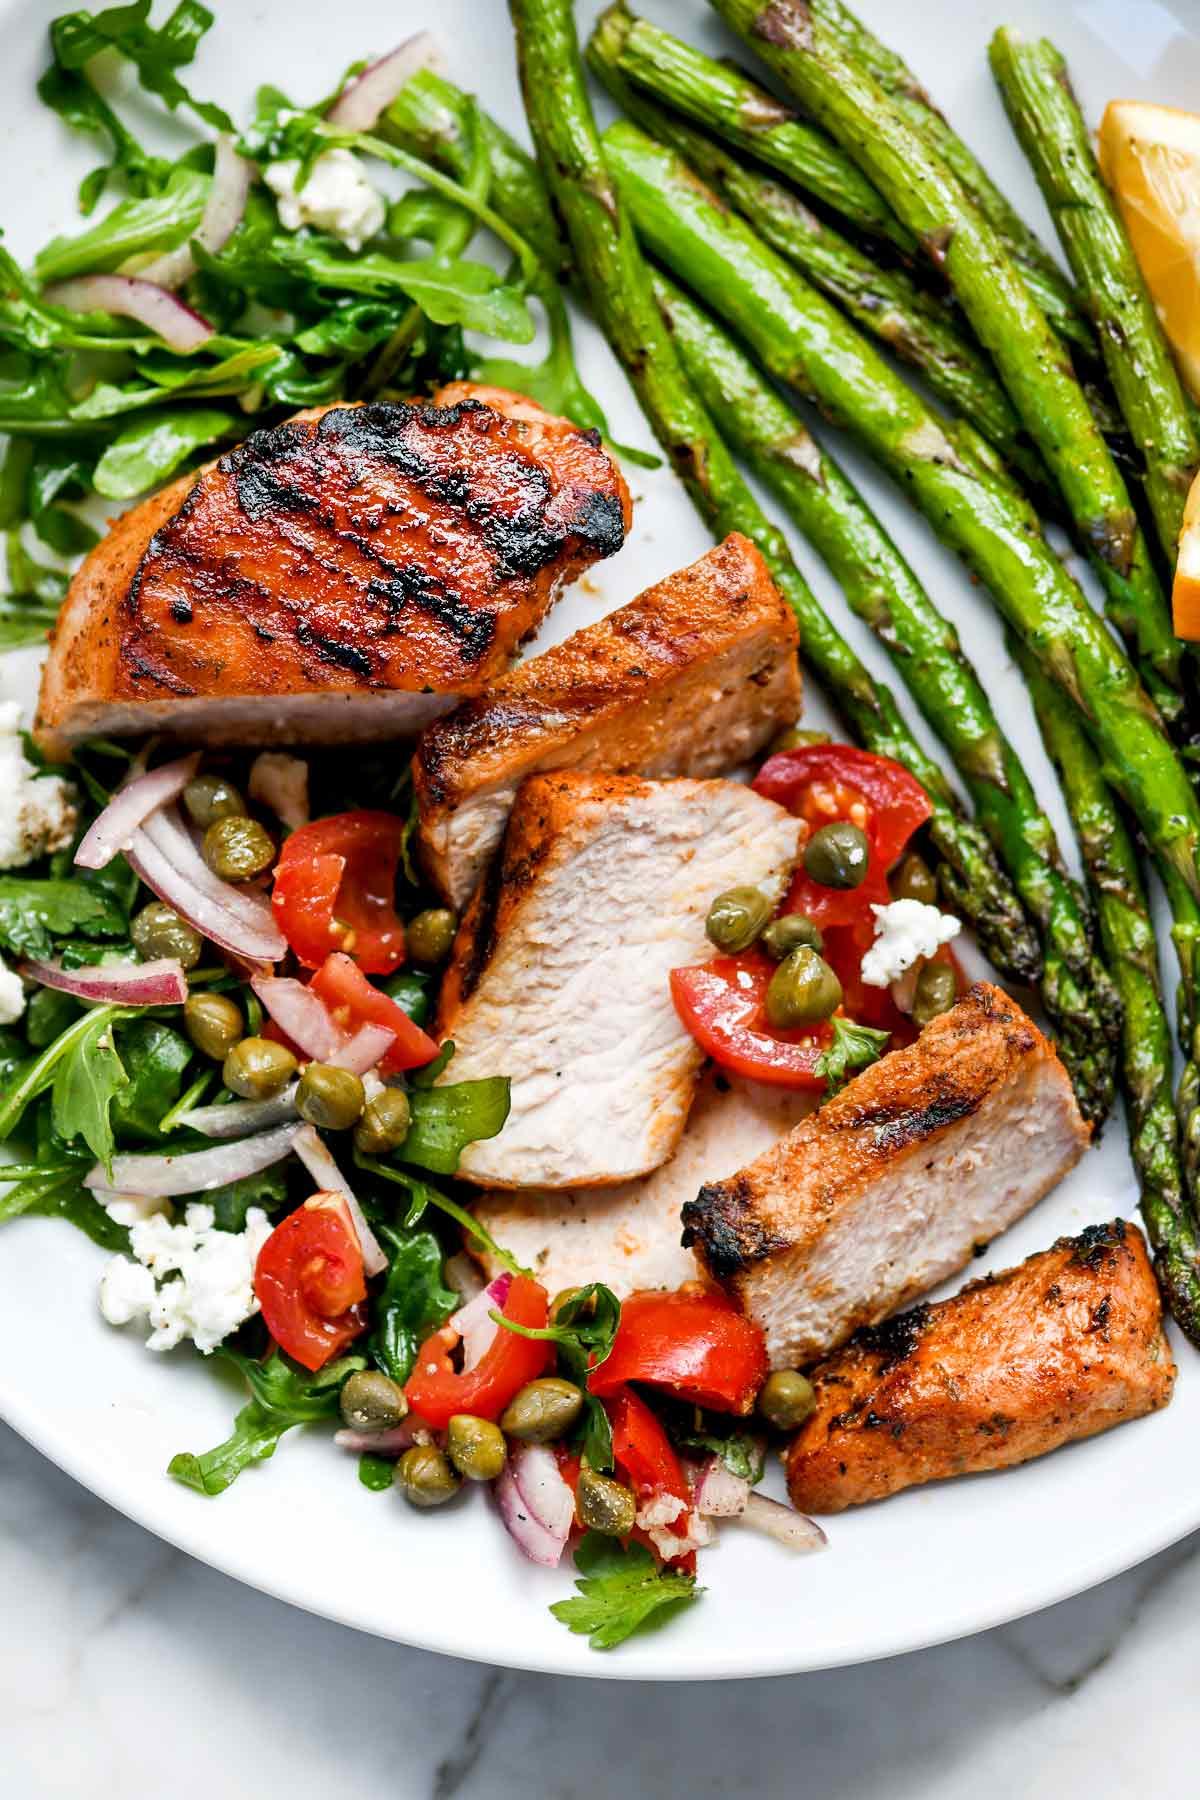 Mediterranean Grilled Pork Chops With Tomato Salad